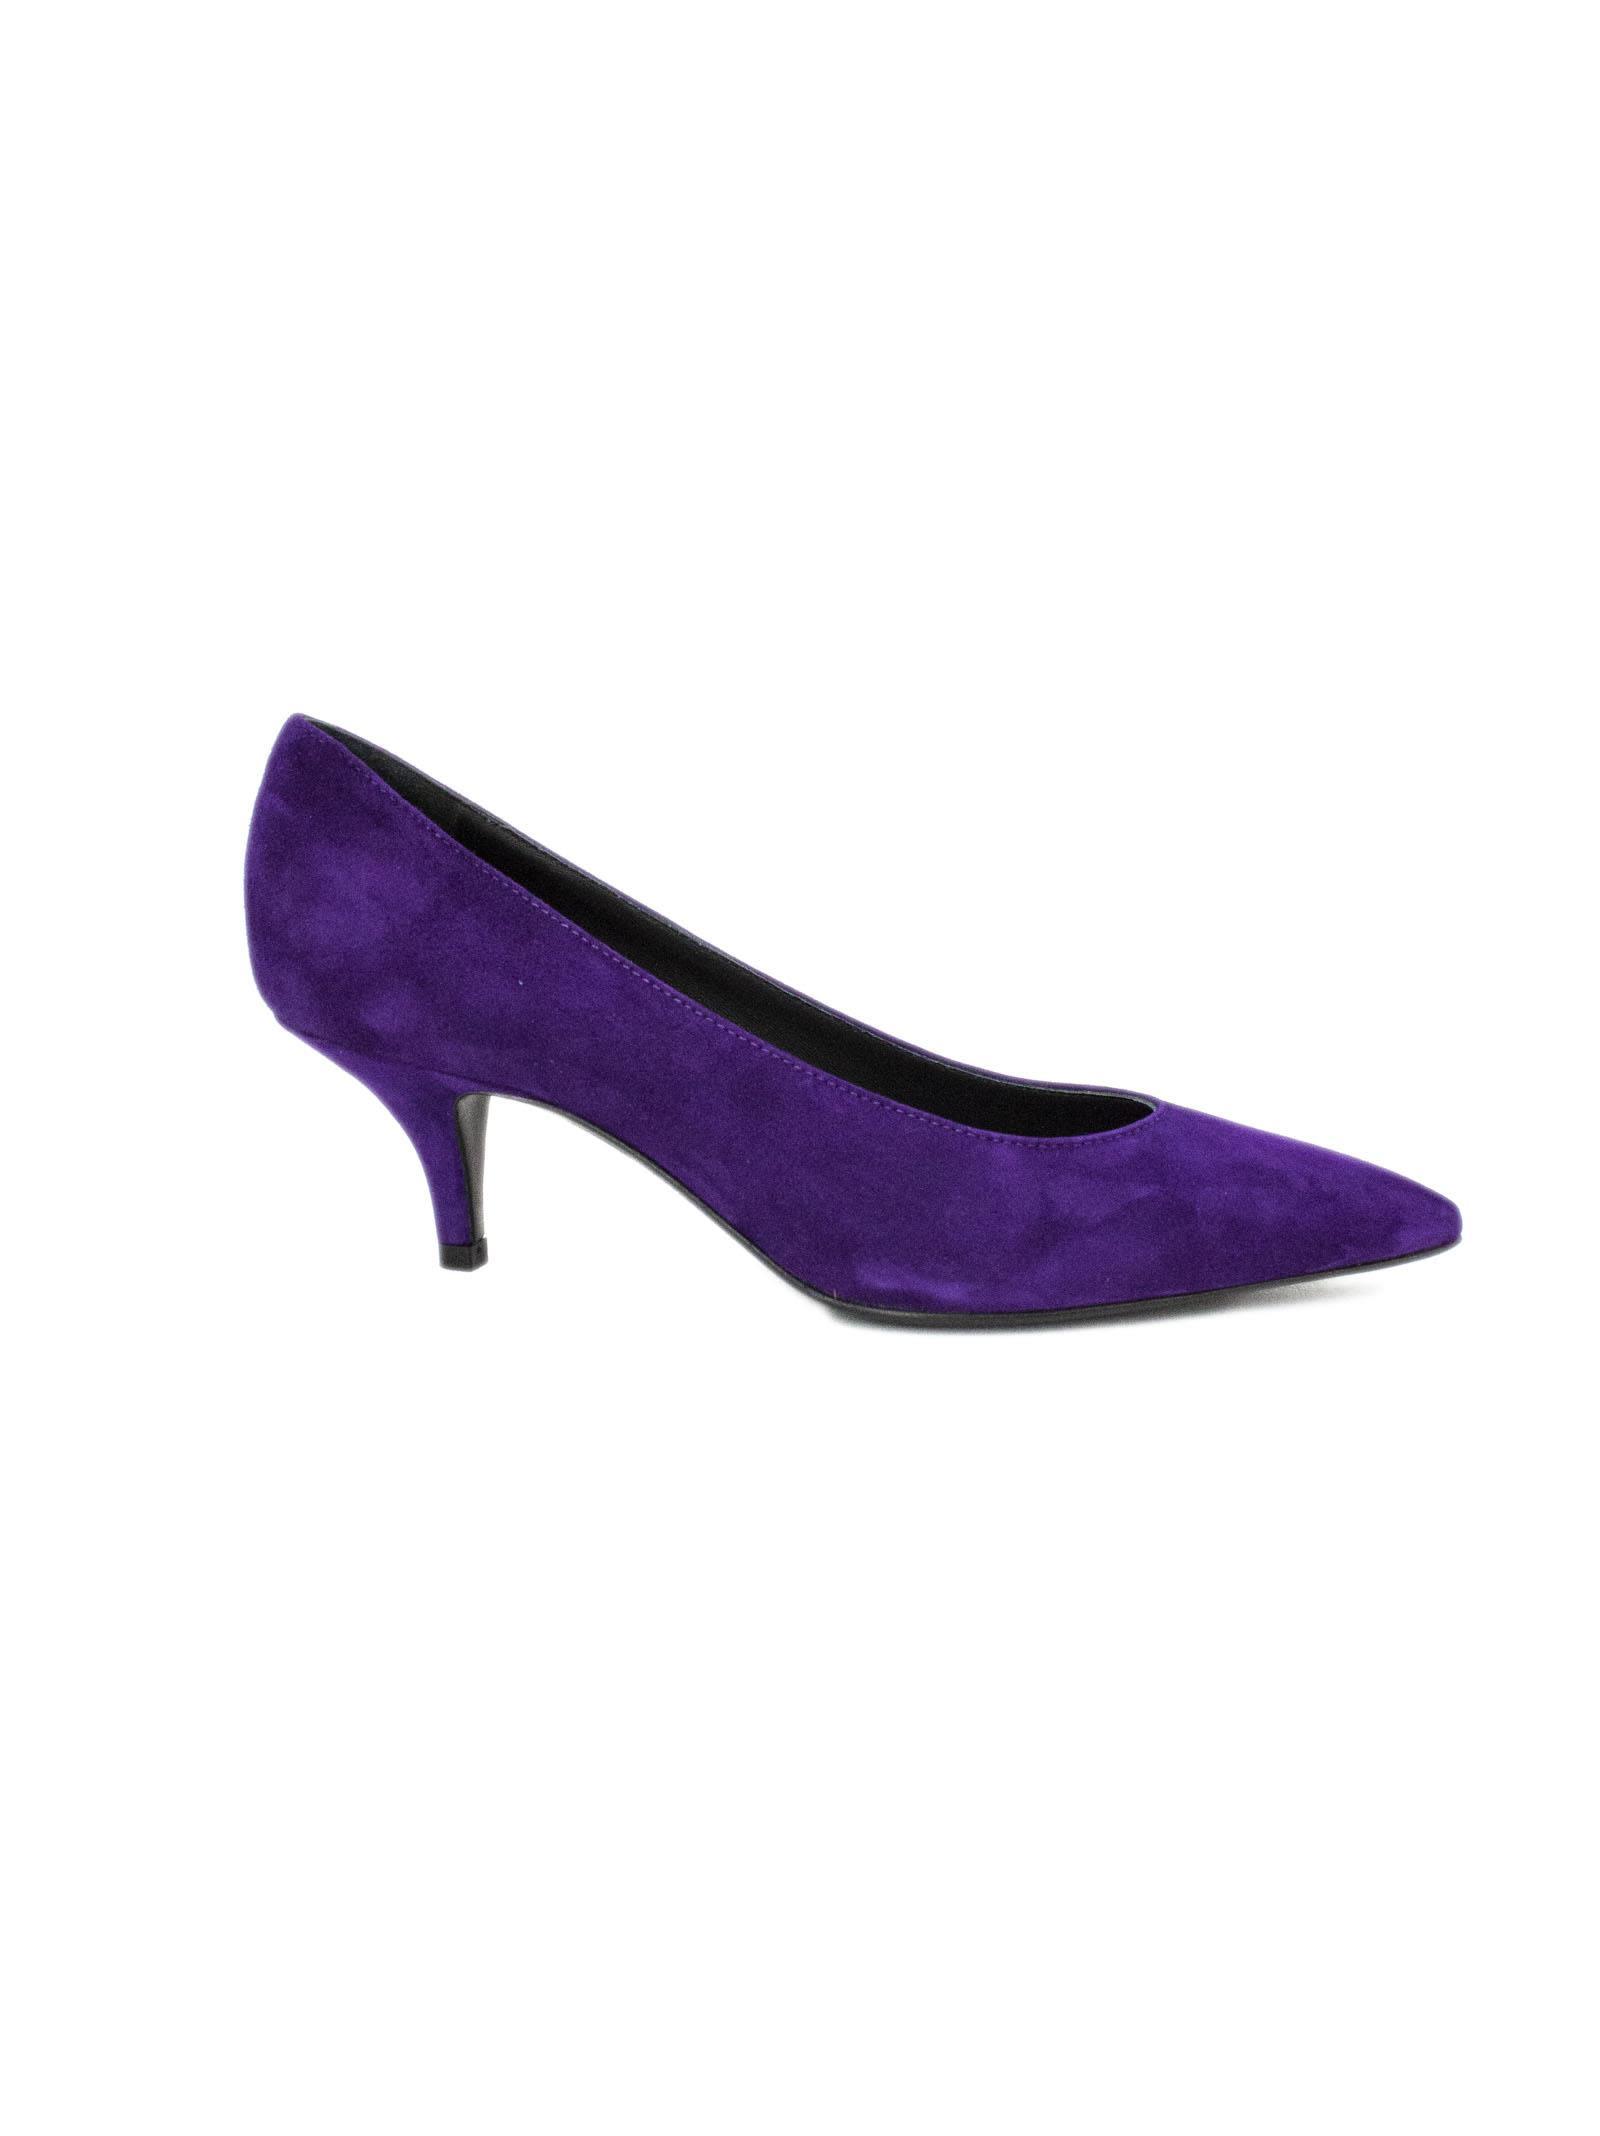 ROBERTO FESTA Claude Dècolletè In Purple Leather. in Dandy